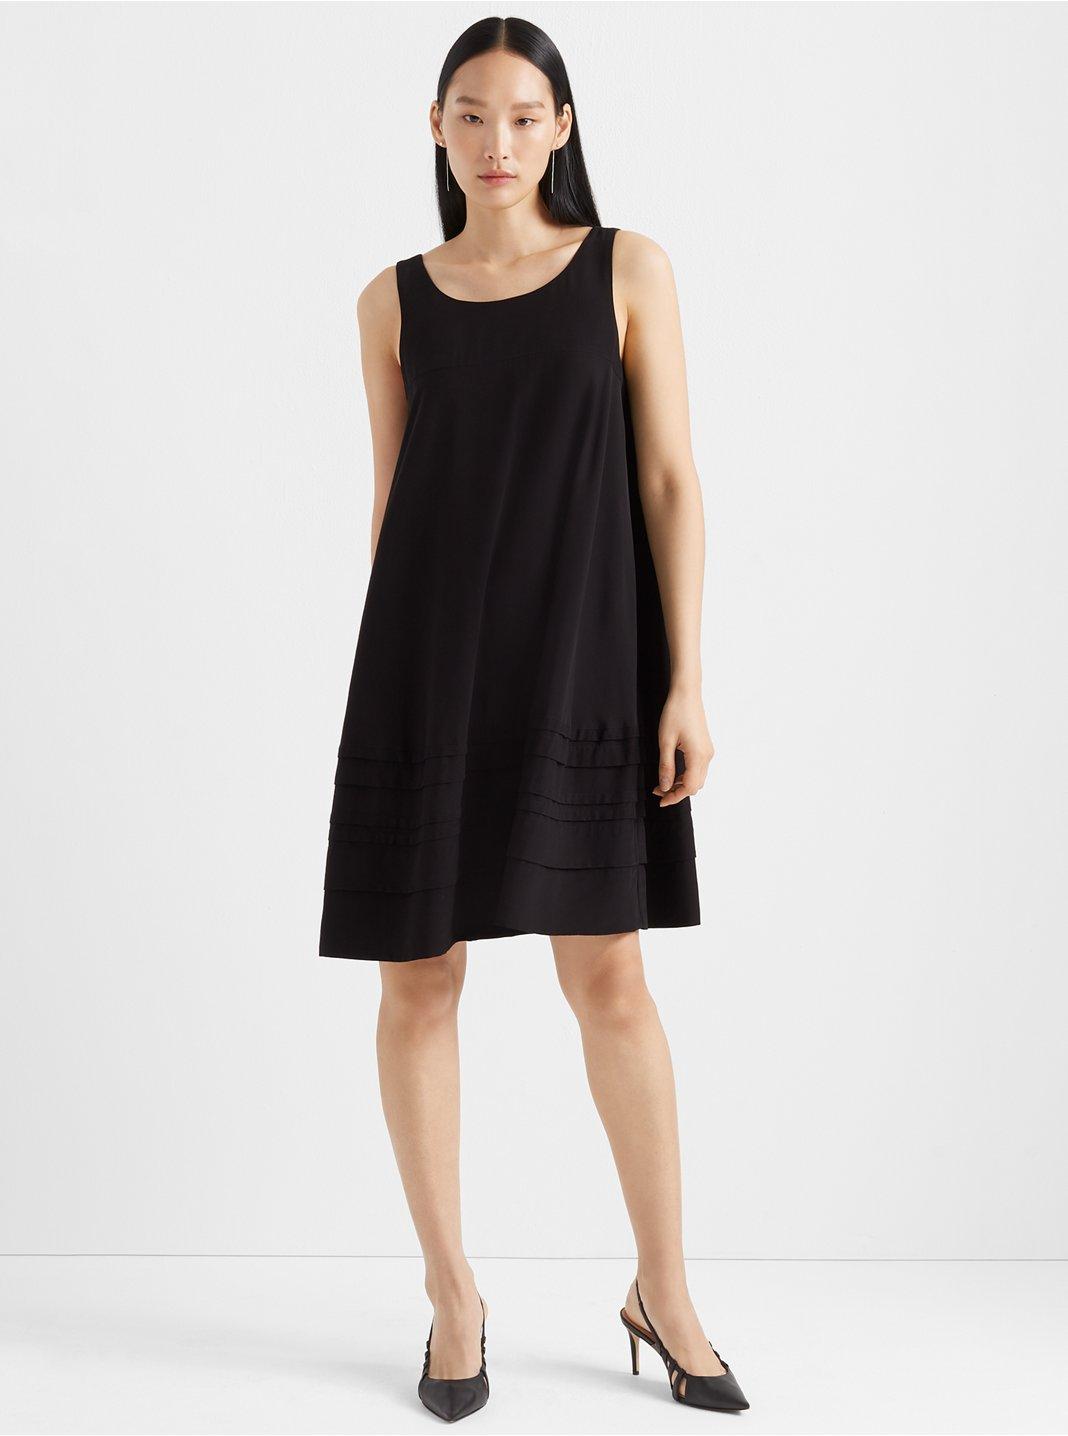 Layered Tuck Dress